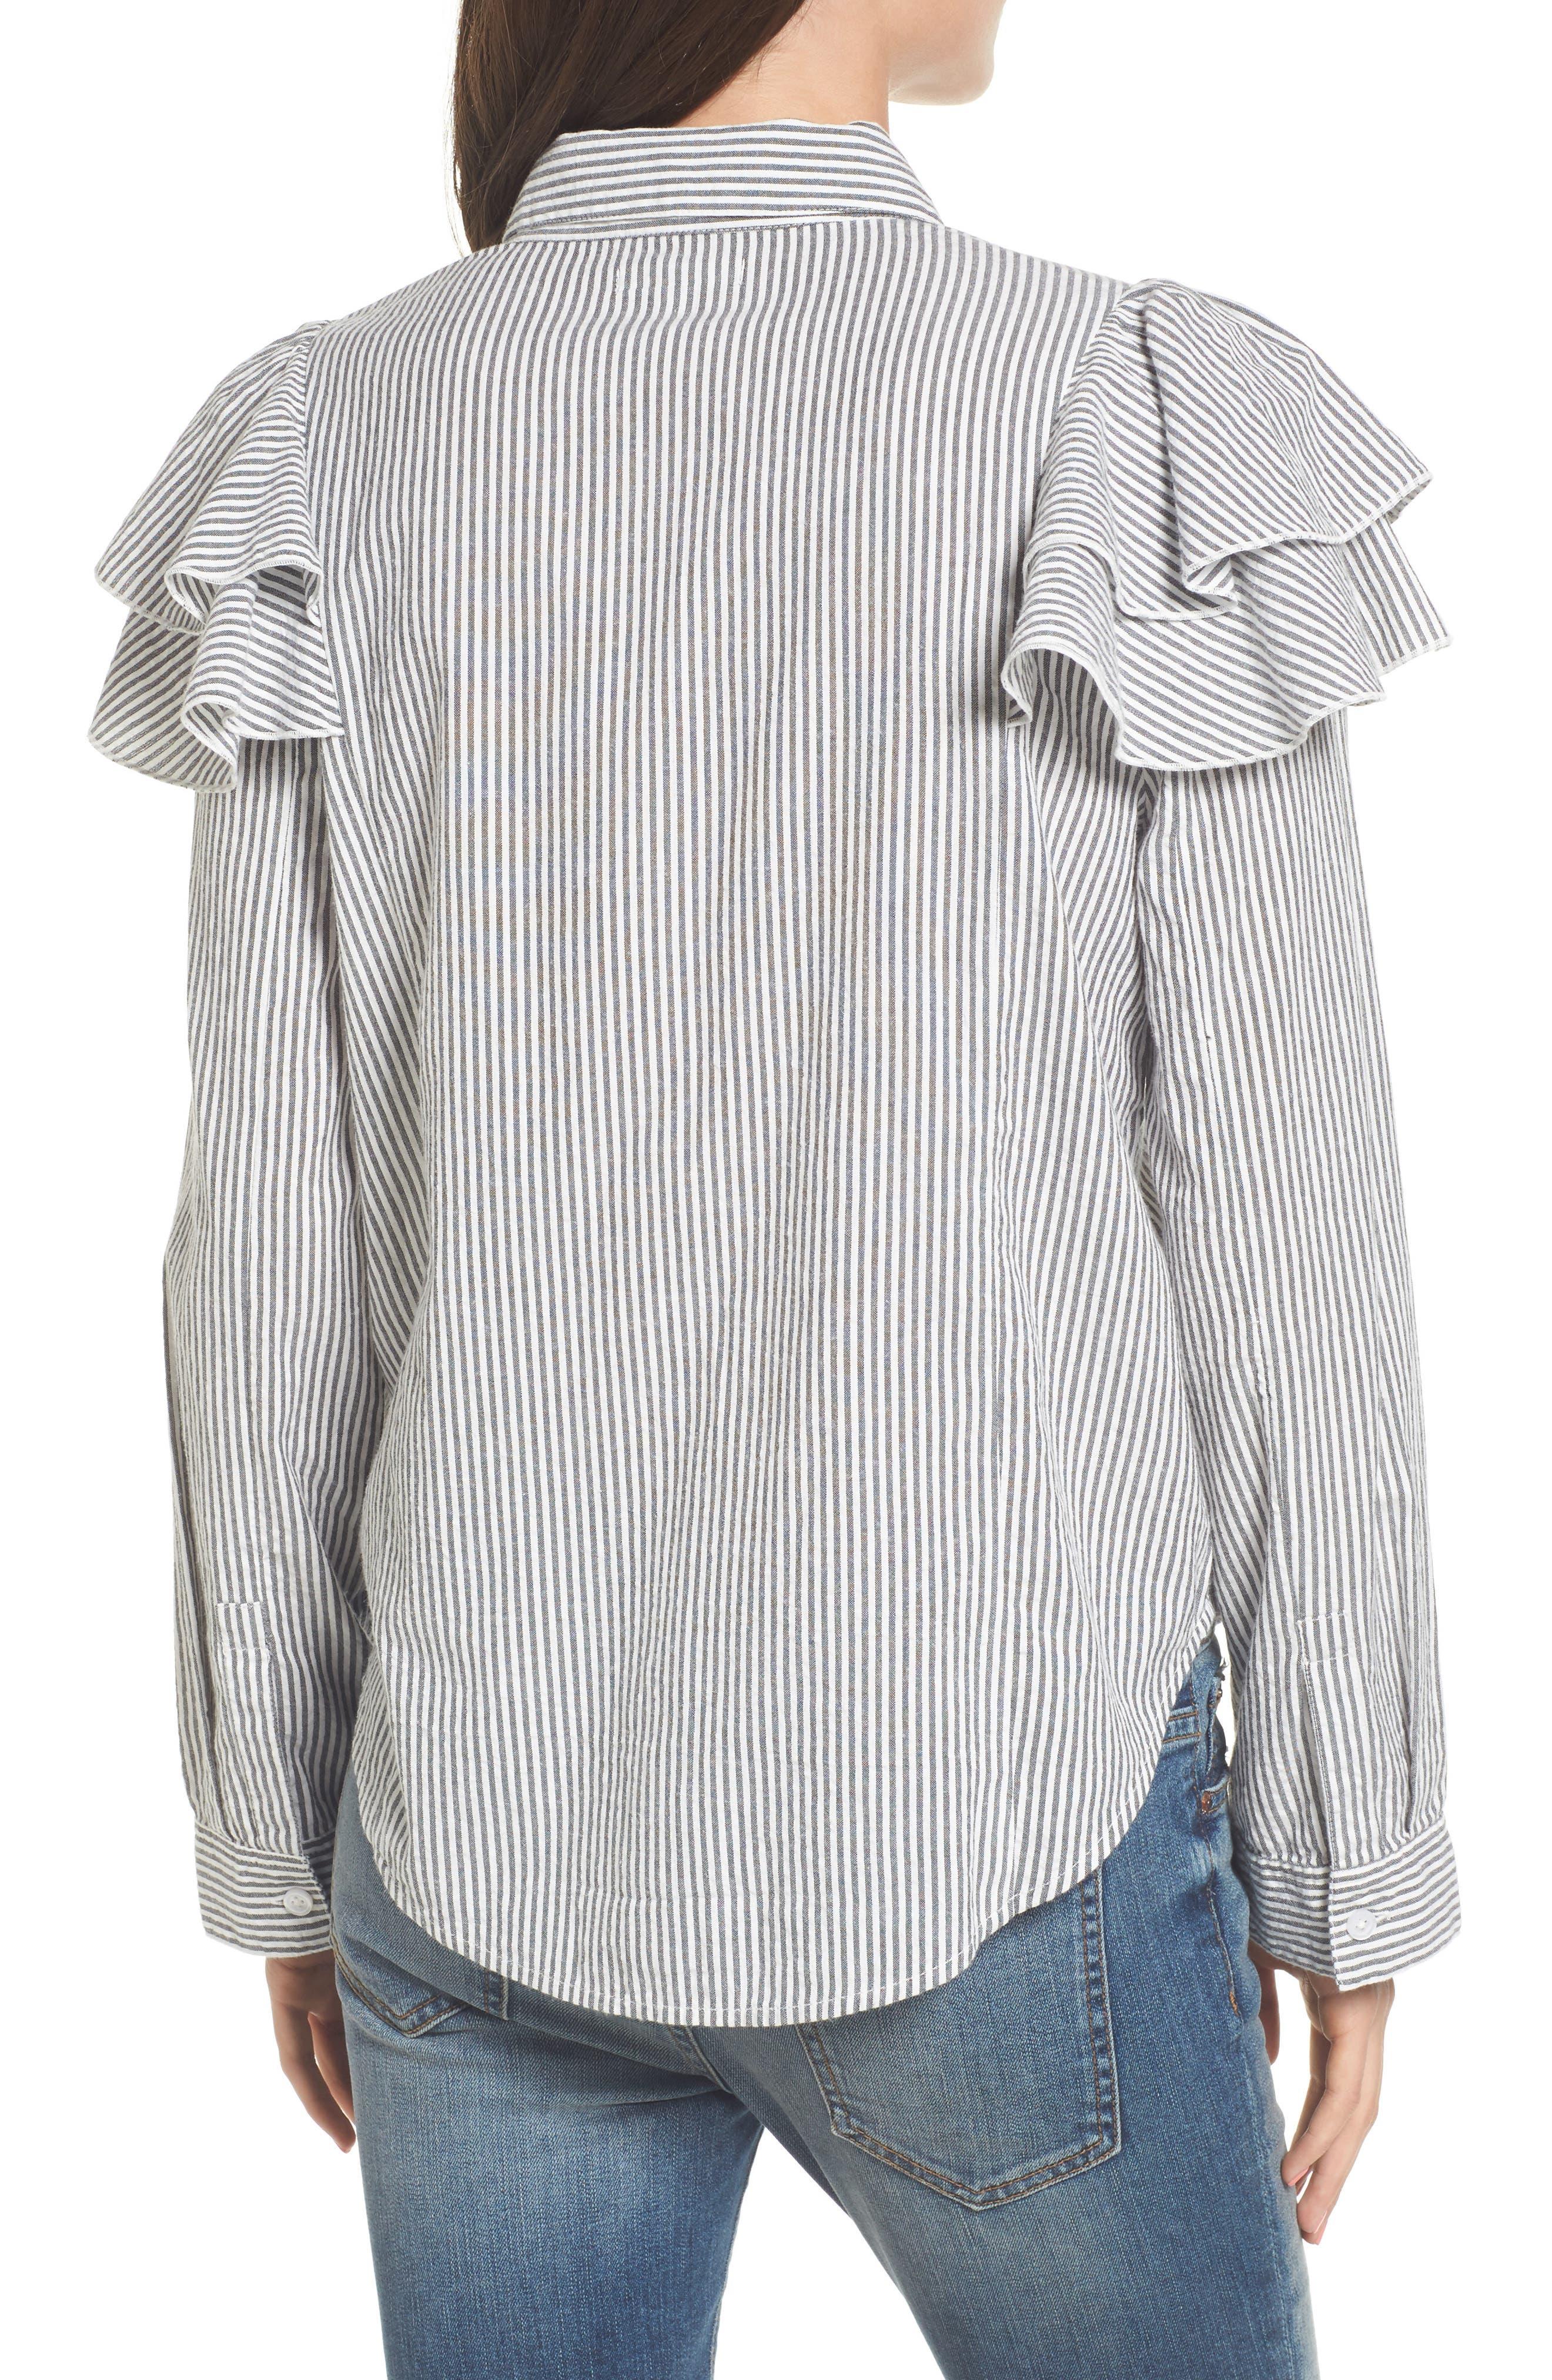 Ruffle Shoulder Shirt,                             Alternate thumbnail 4, color,